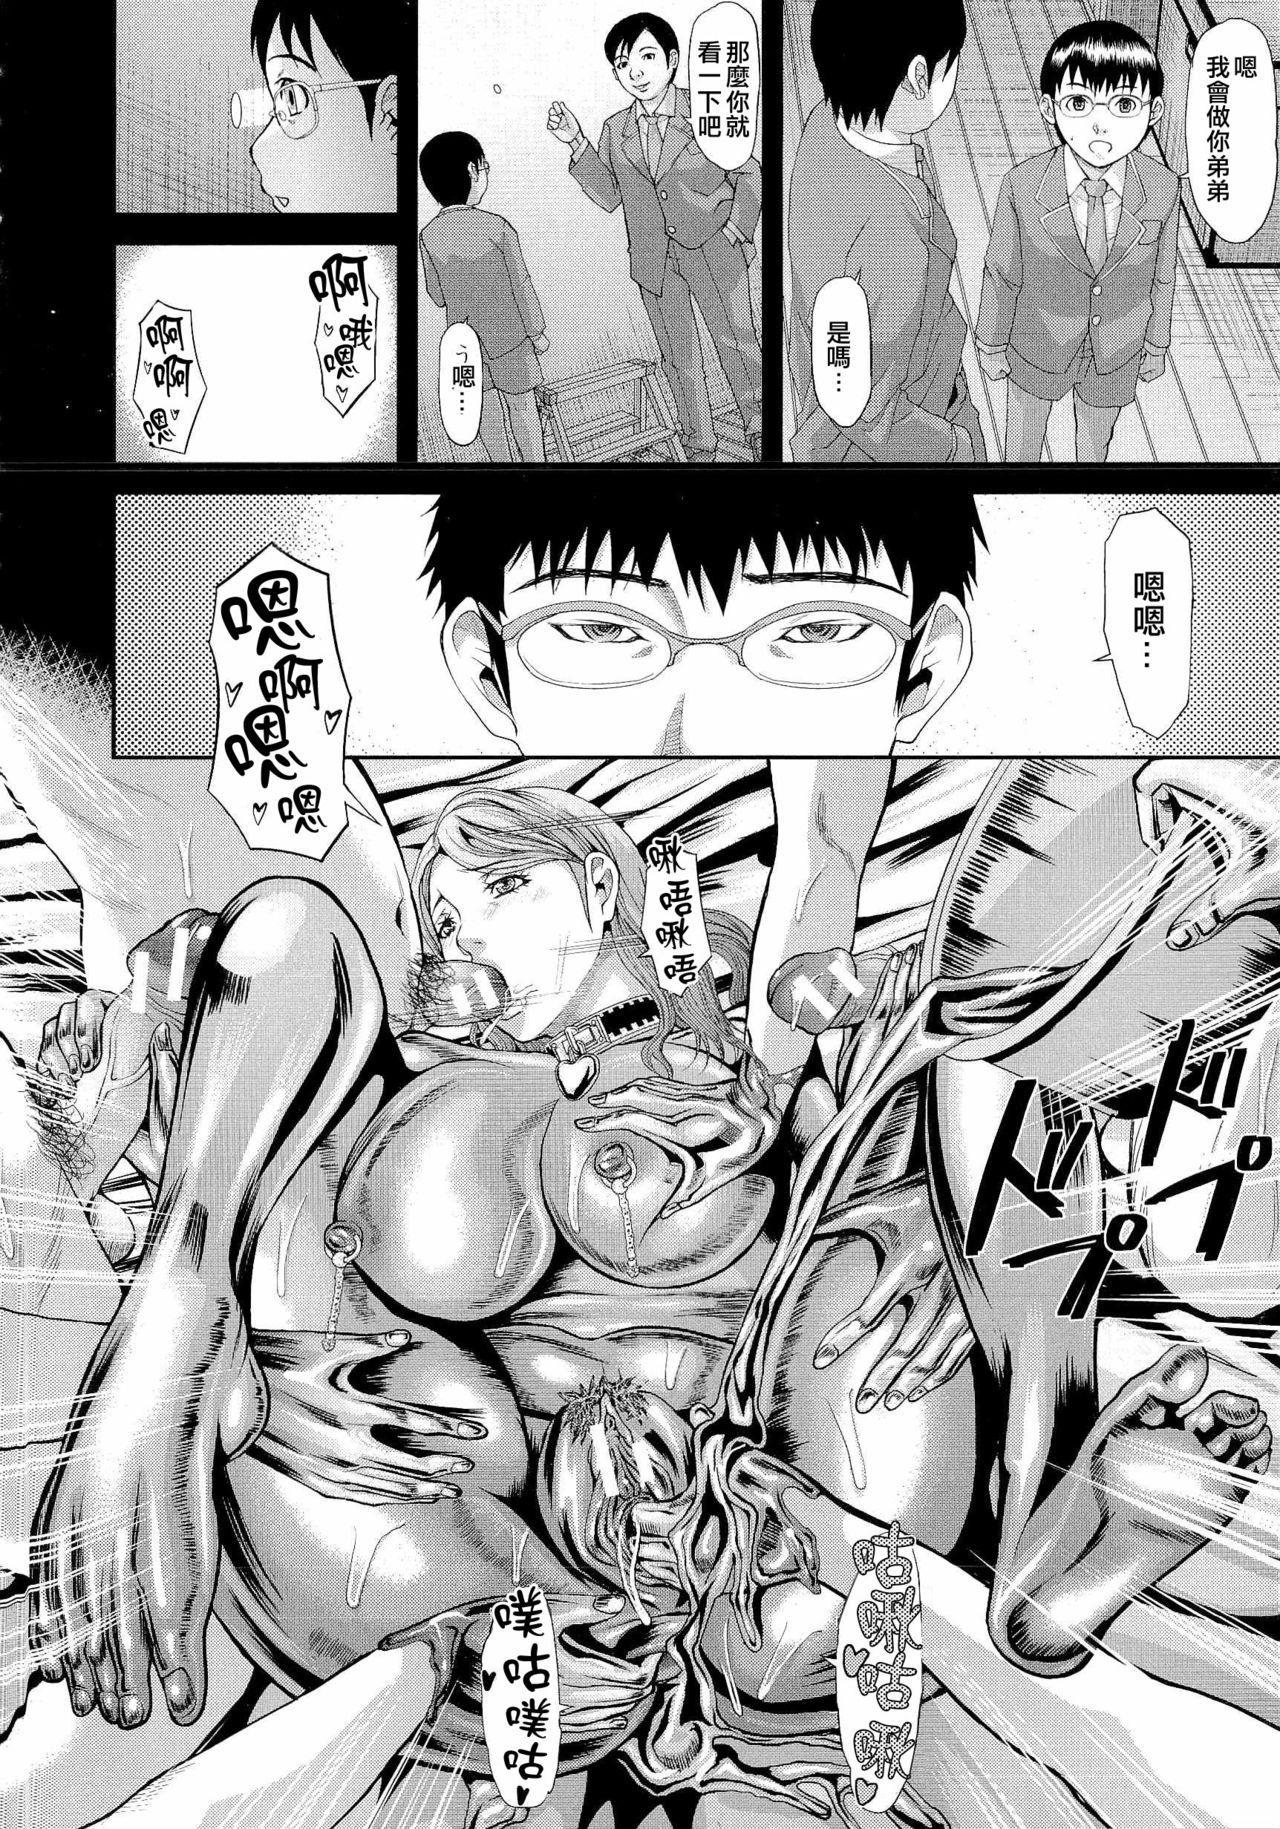 [Honebuto Danshaku] Innou Kaizou Program ~Oyako Zecchou Cult Ochi~ [Chinese]【不想记名重嵌--高质量图源】 126